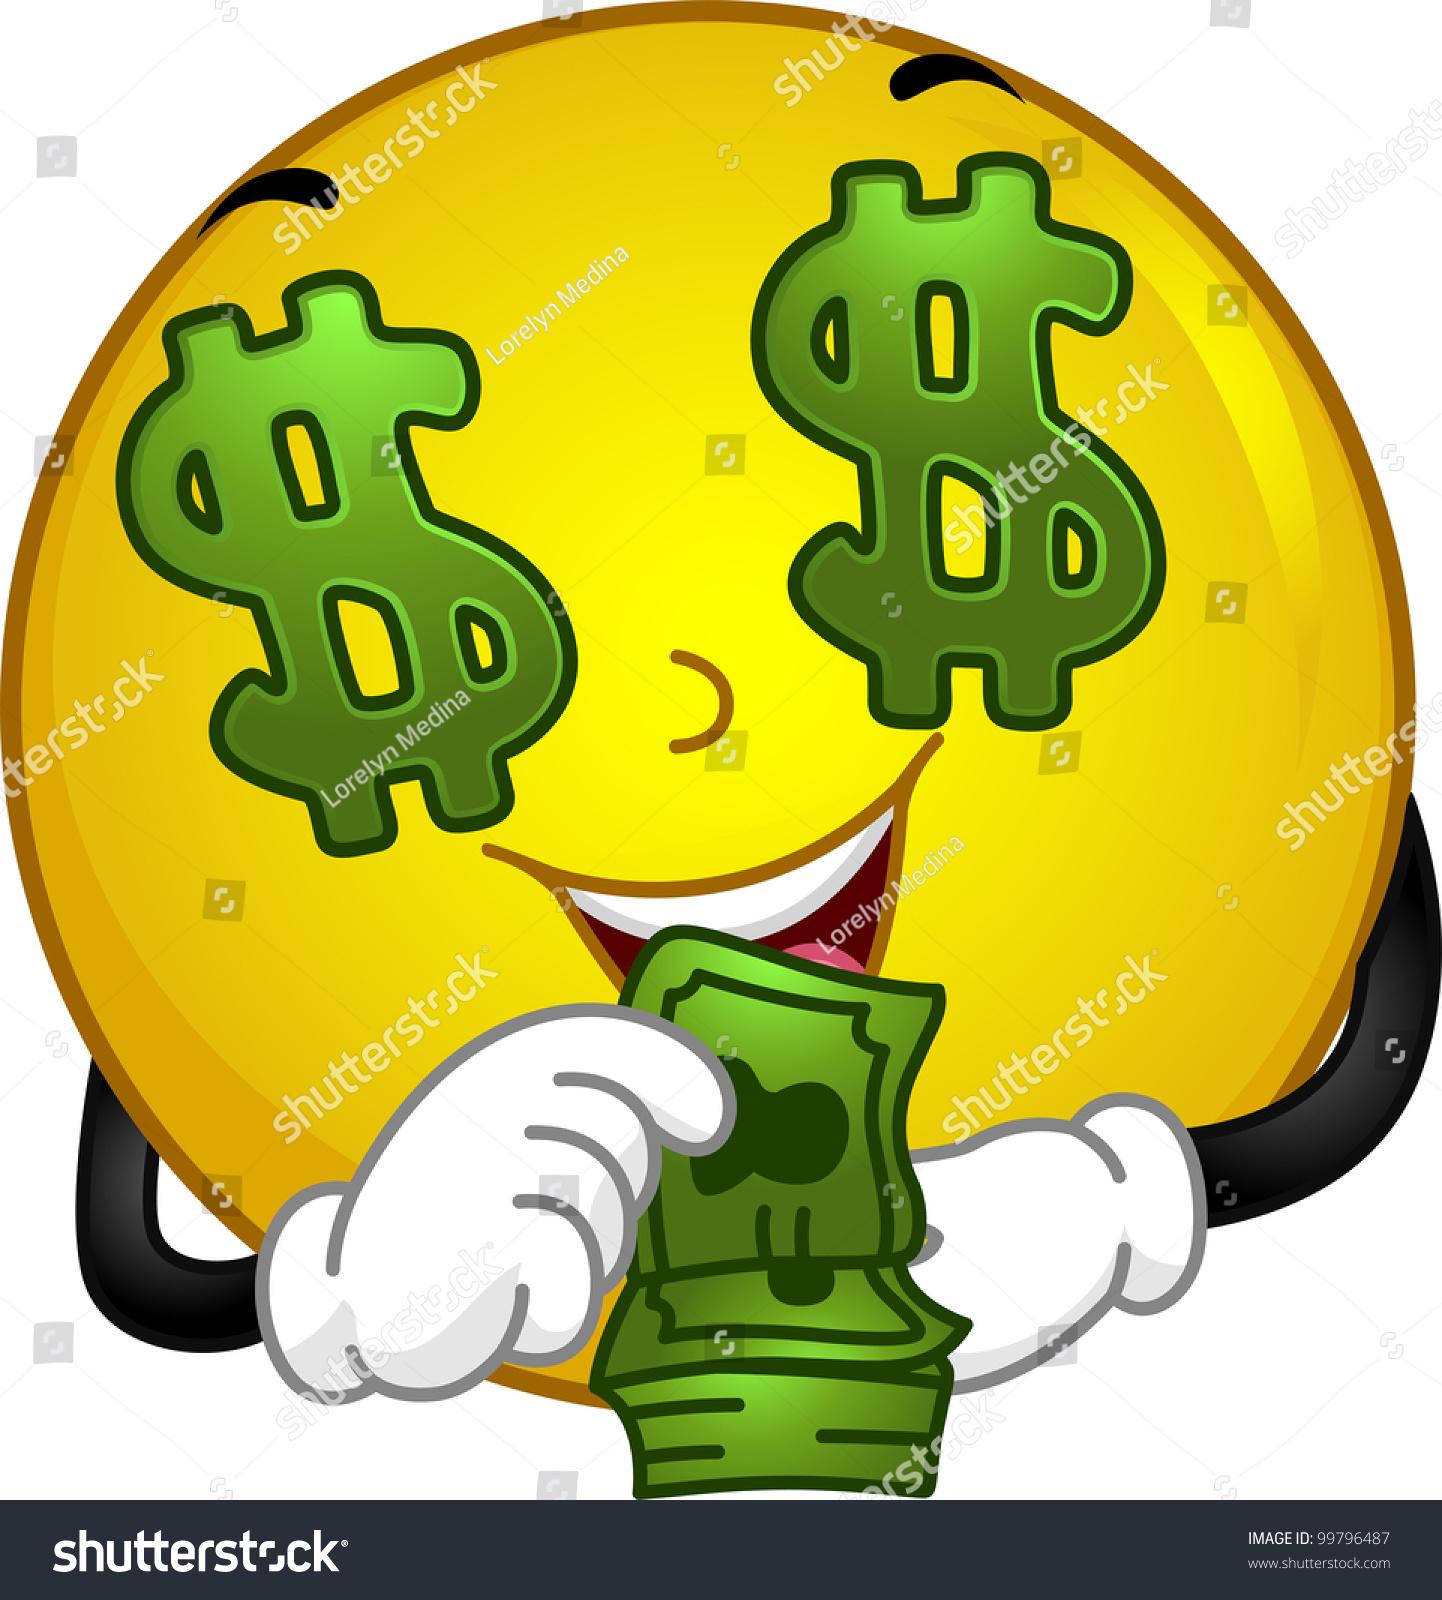 Illustration Featuring Moneyloving Smiley Stock Vector